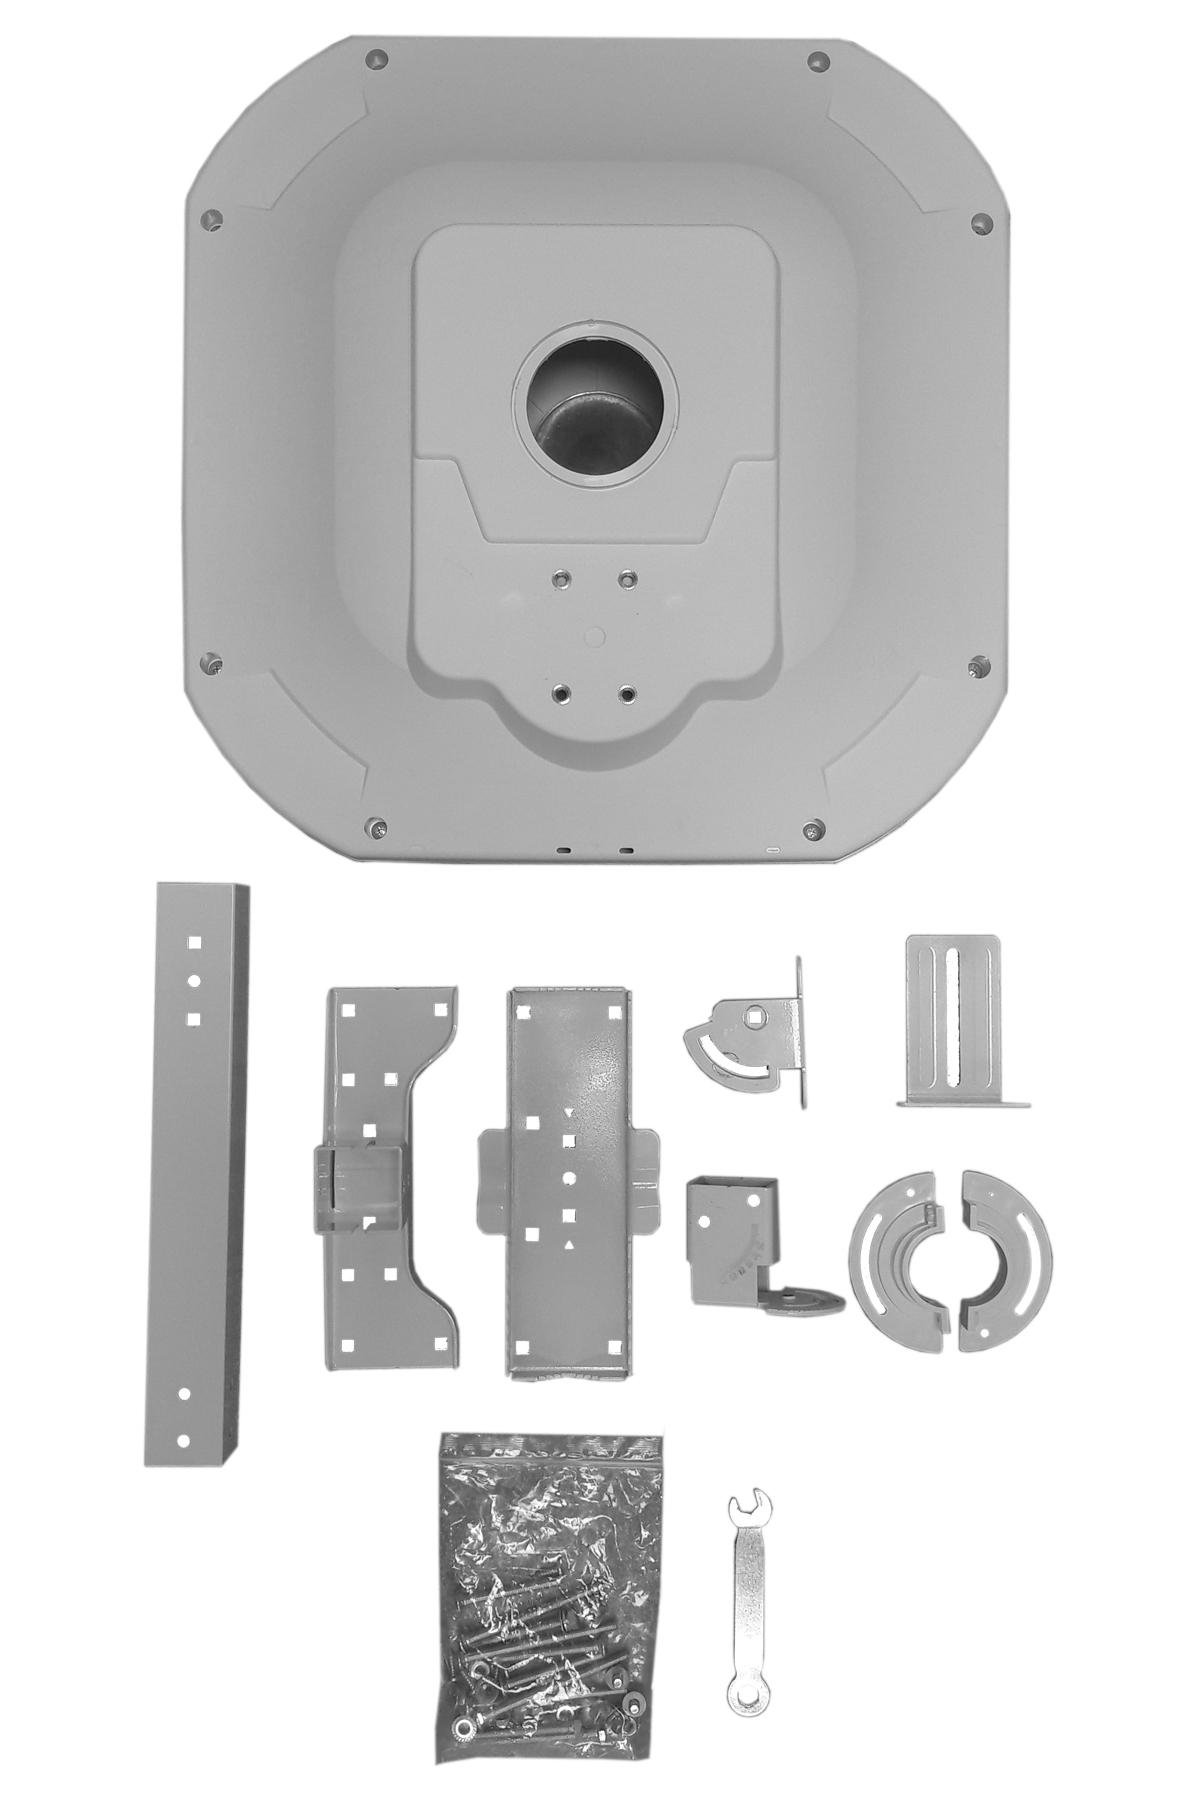 PremiumX FLAT43 Sat Flachantenne mit Digital Quad LNB - Satellitenanlage für 4 Teilnehmer – 4K UHD FullHD HD